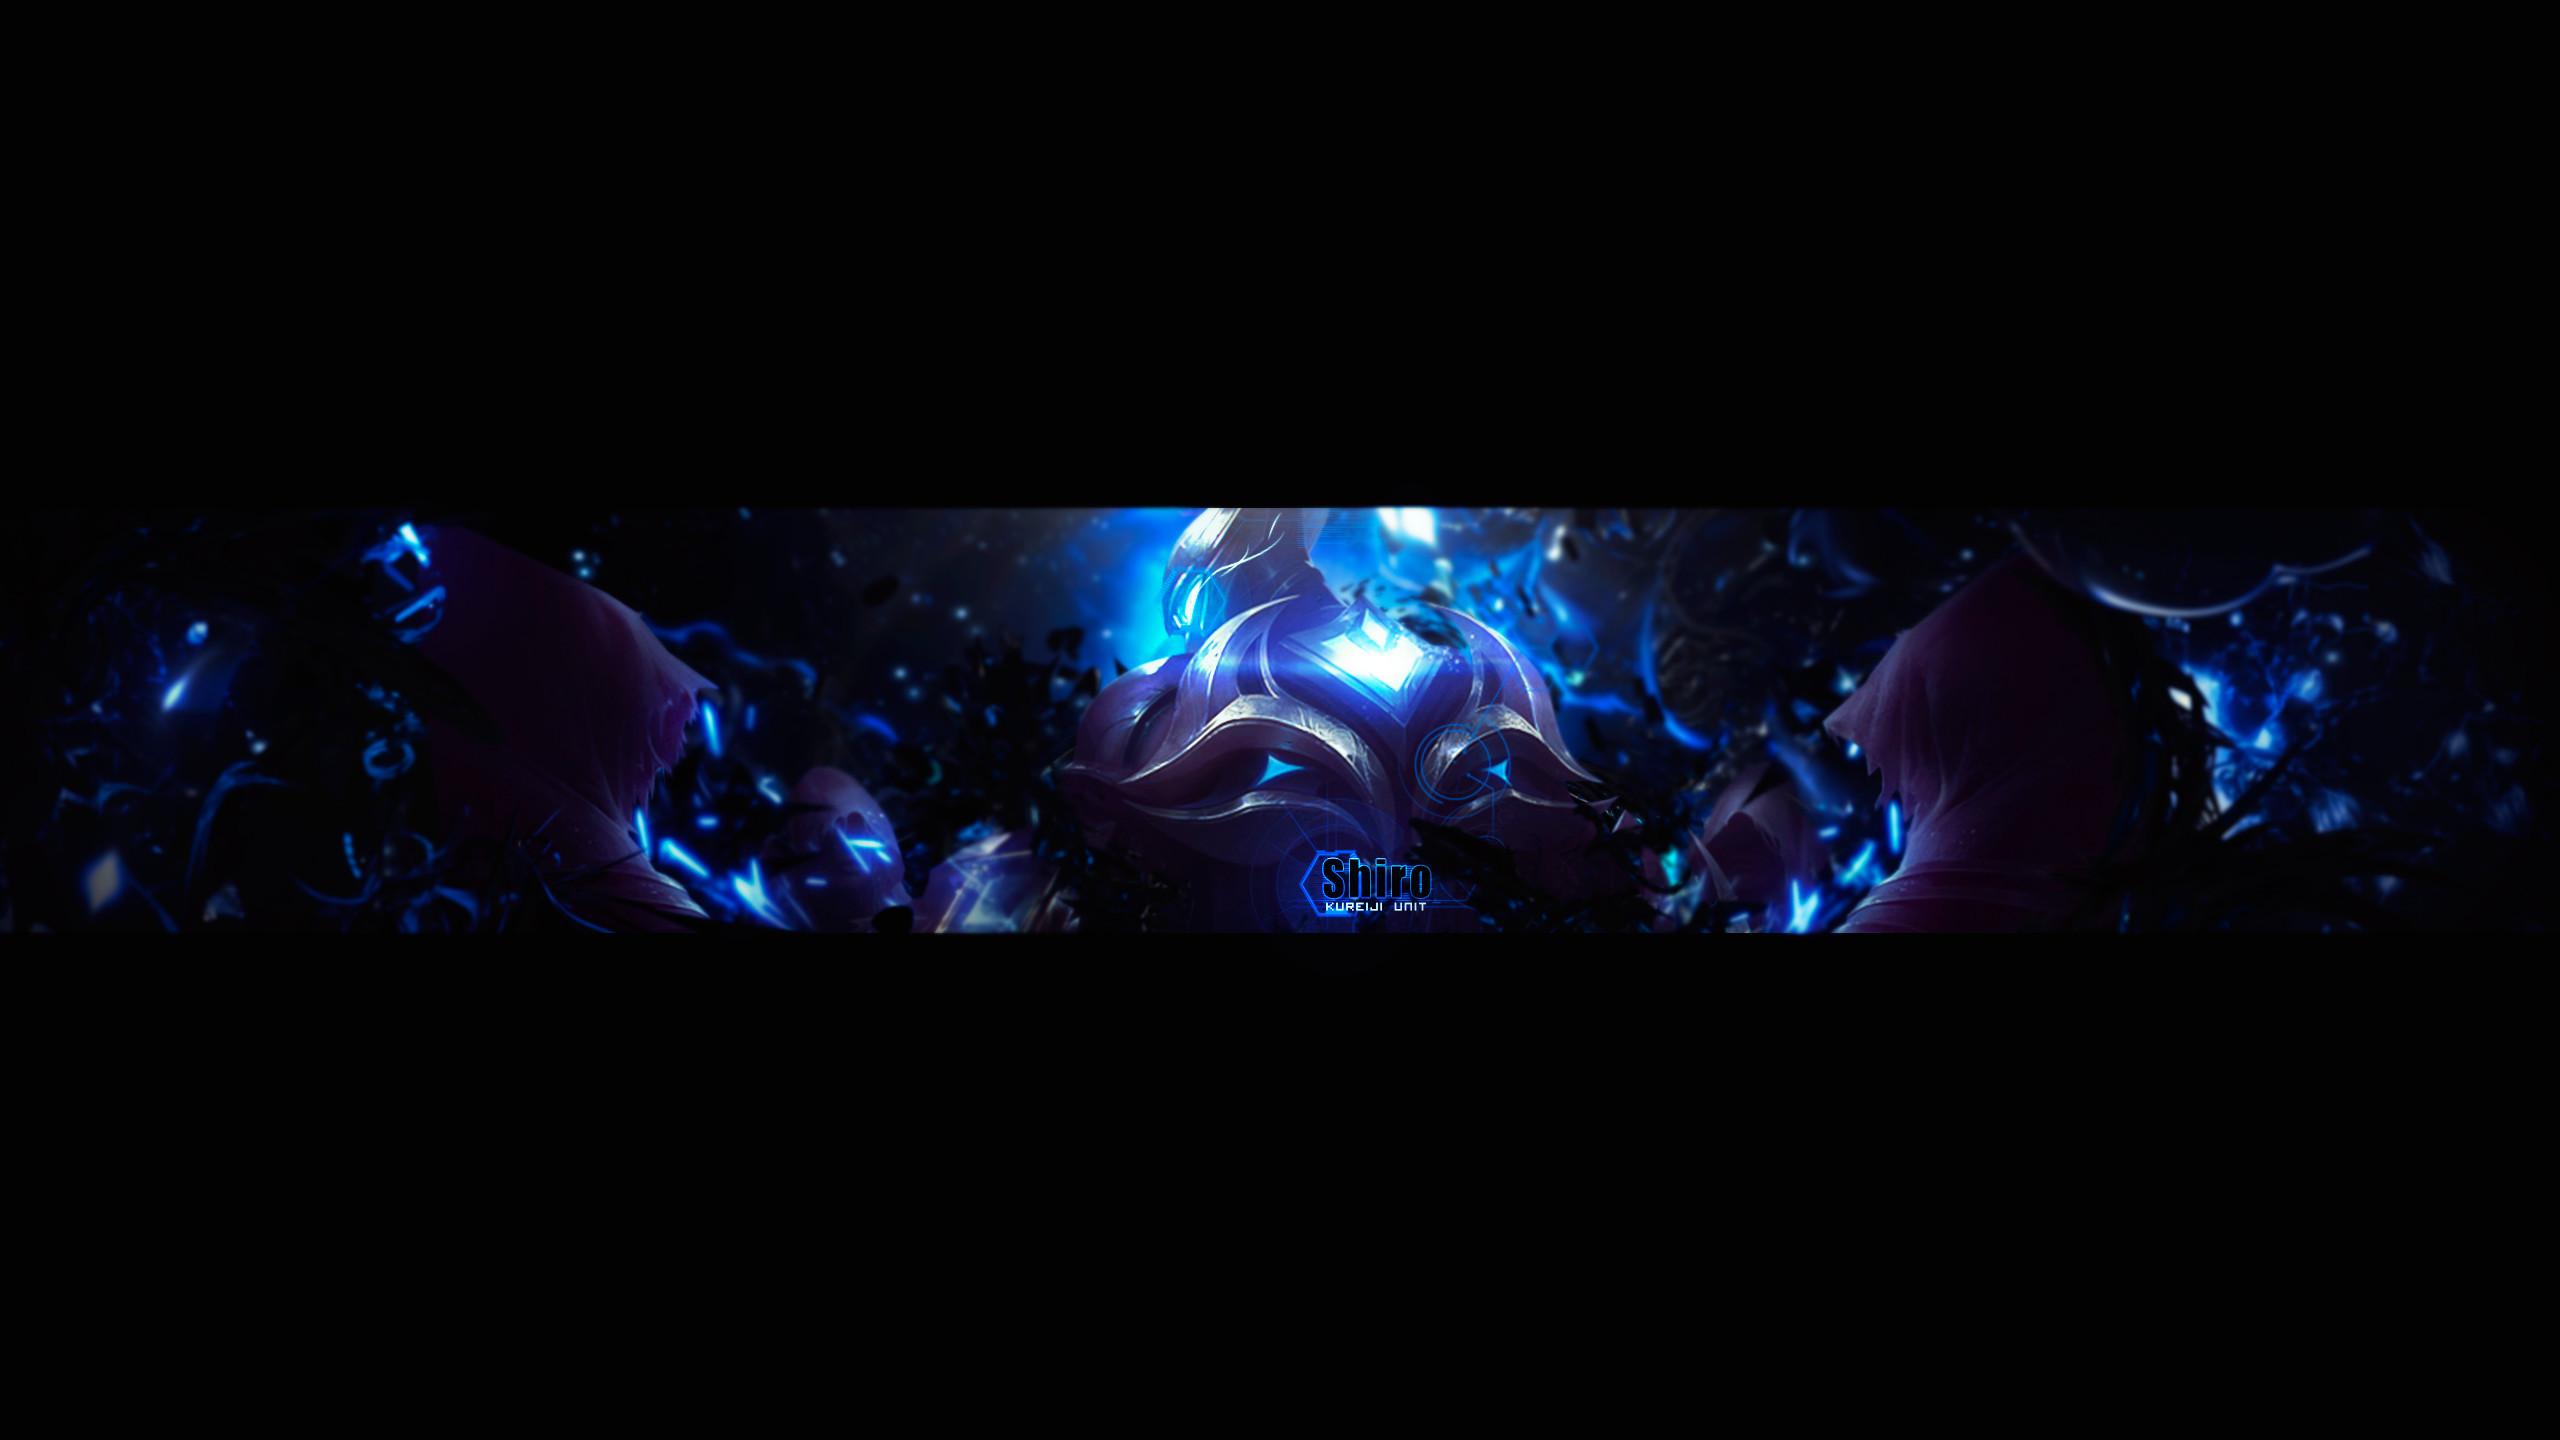 Shiro YouTube Banner by DeyKyra Shiro YouTube Banner by DeyKyra